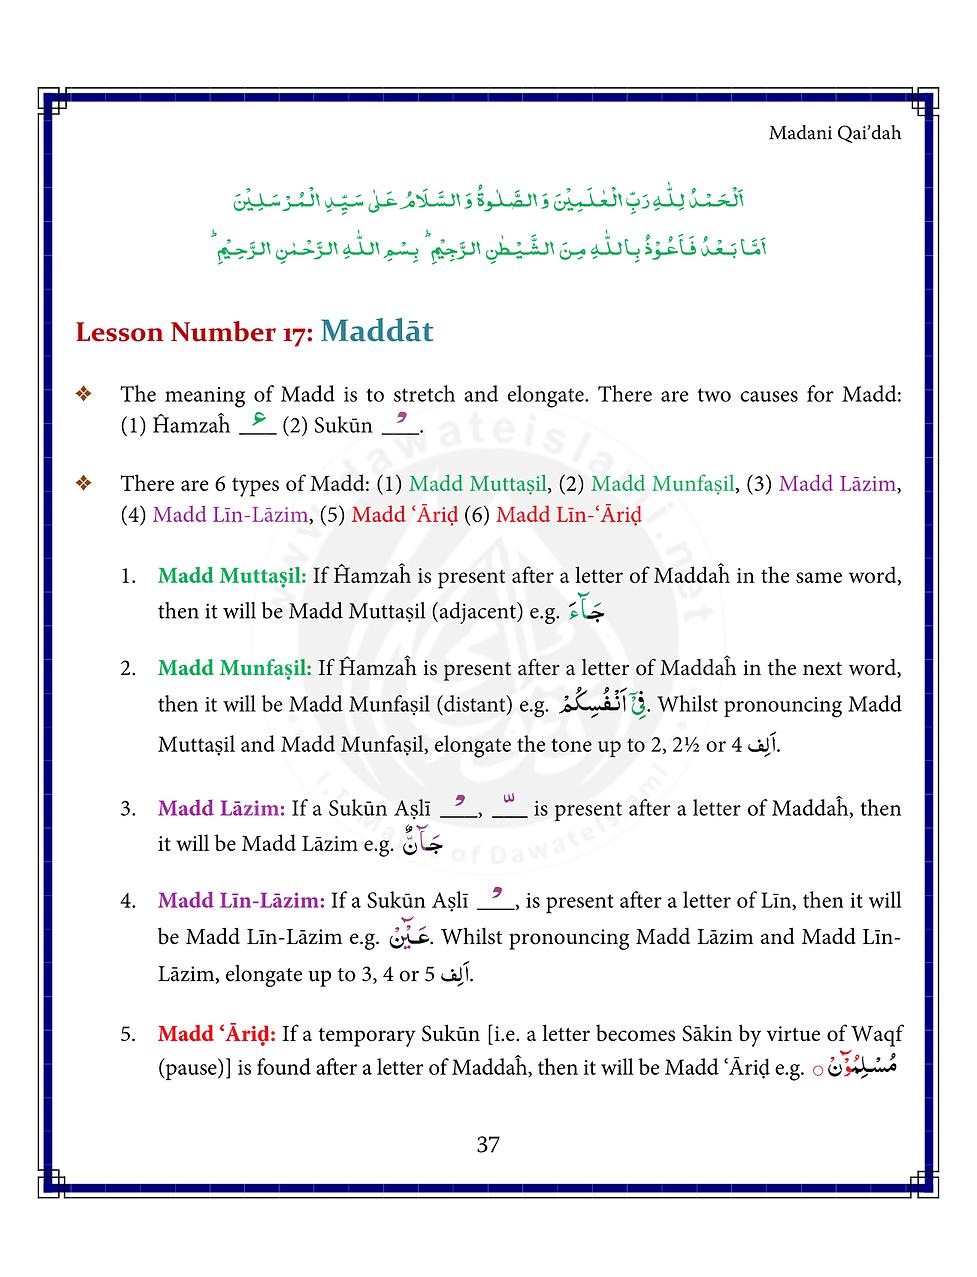 Madani Qaidah-47.png